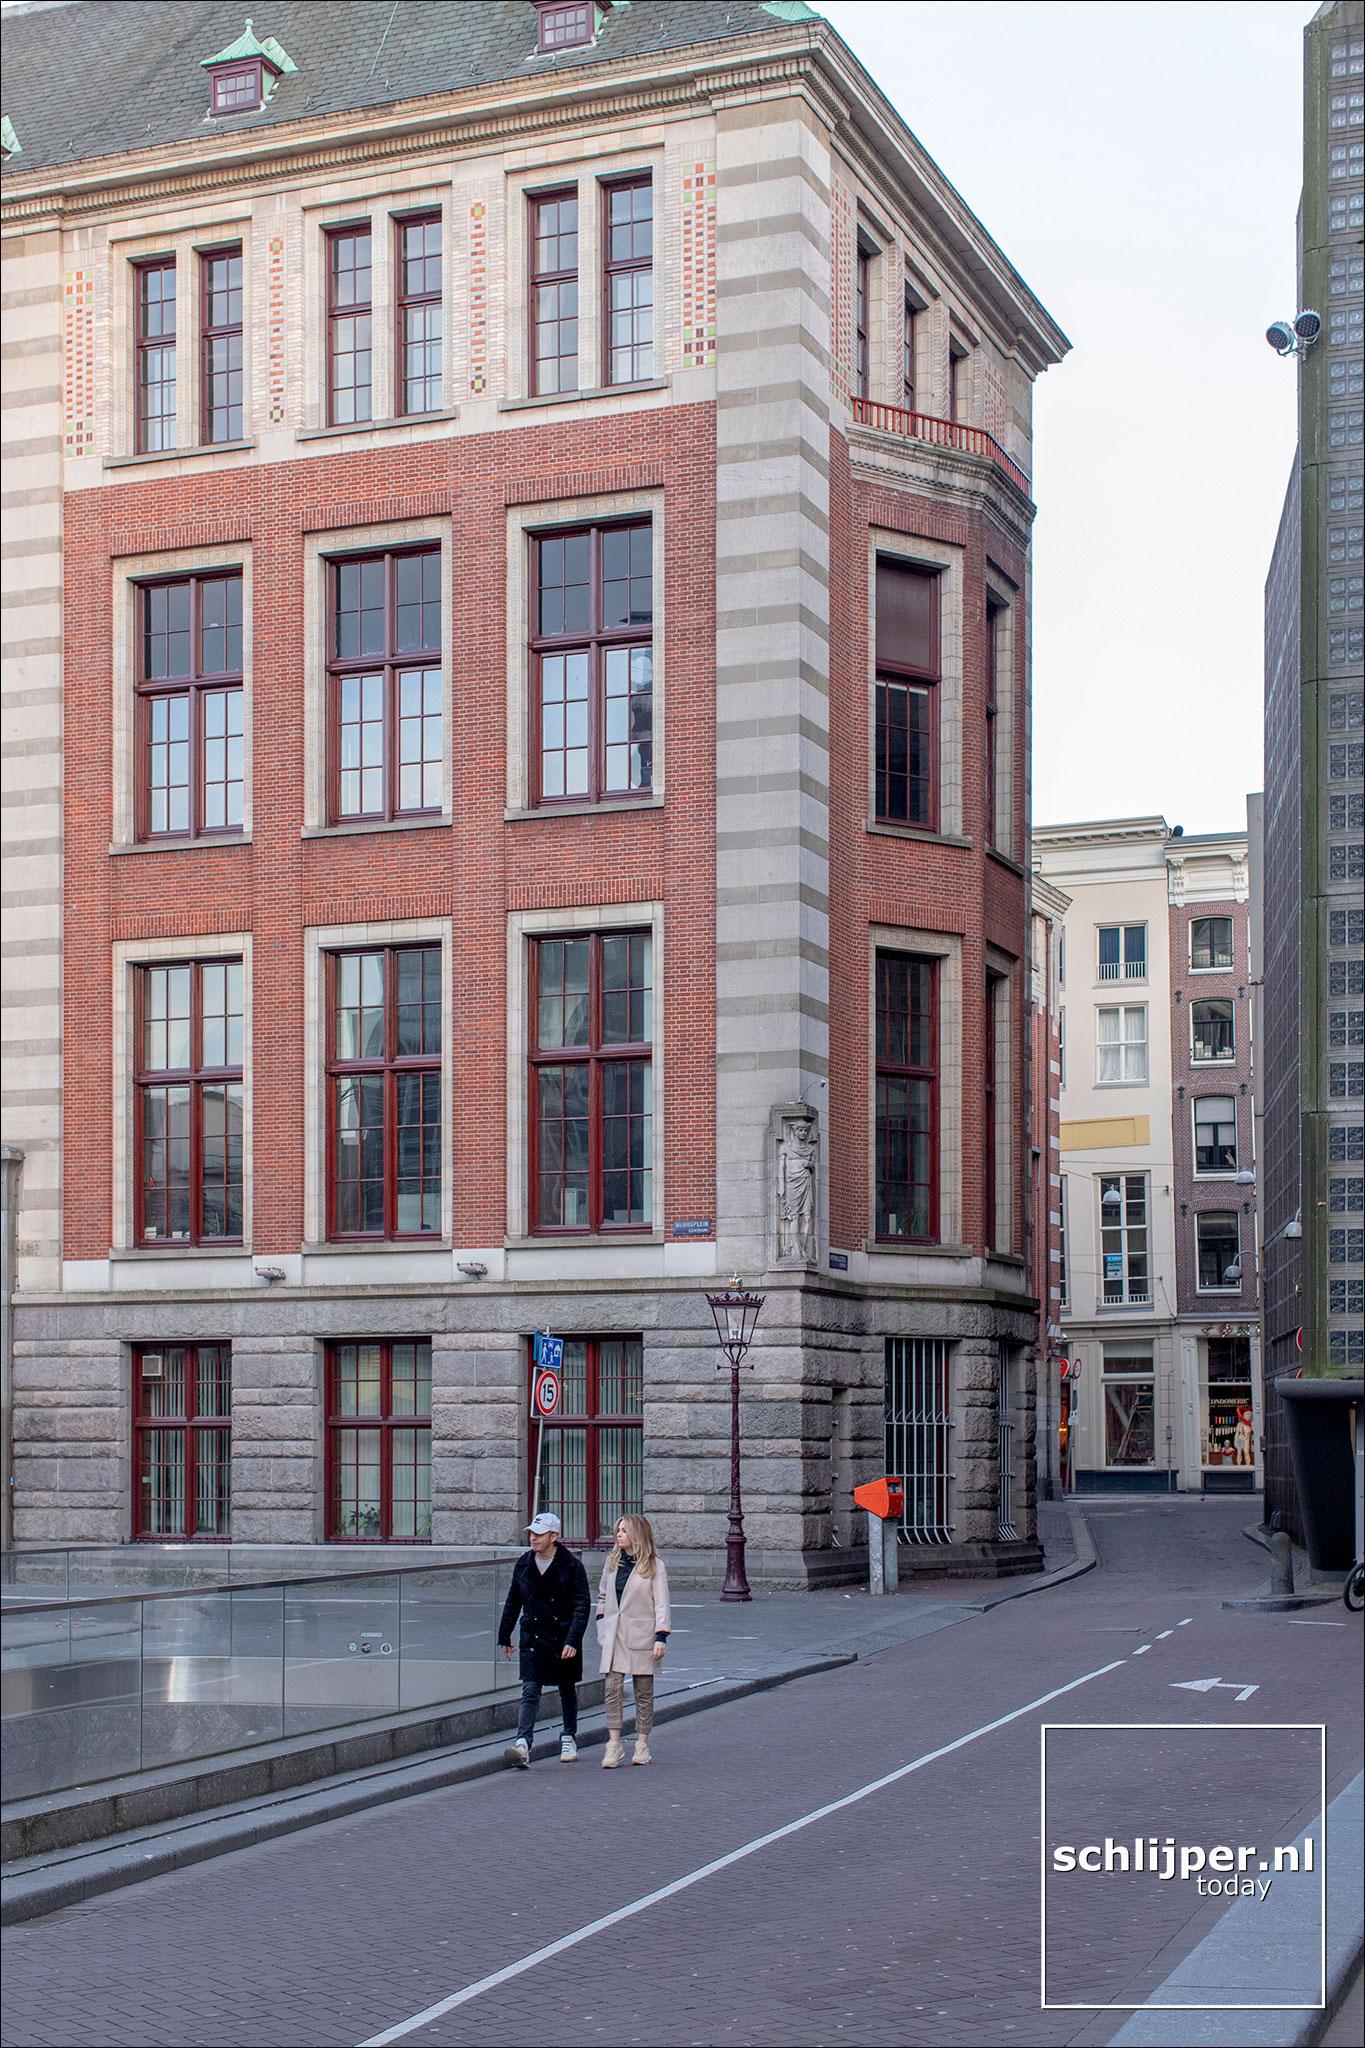 Nederland, Amsterdam, 24 maart 2020